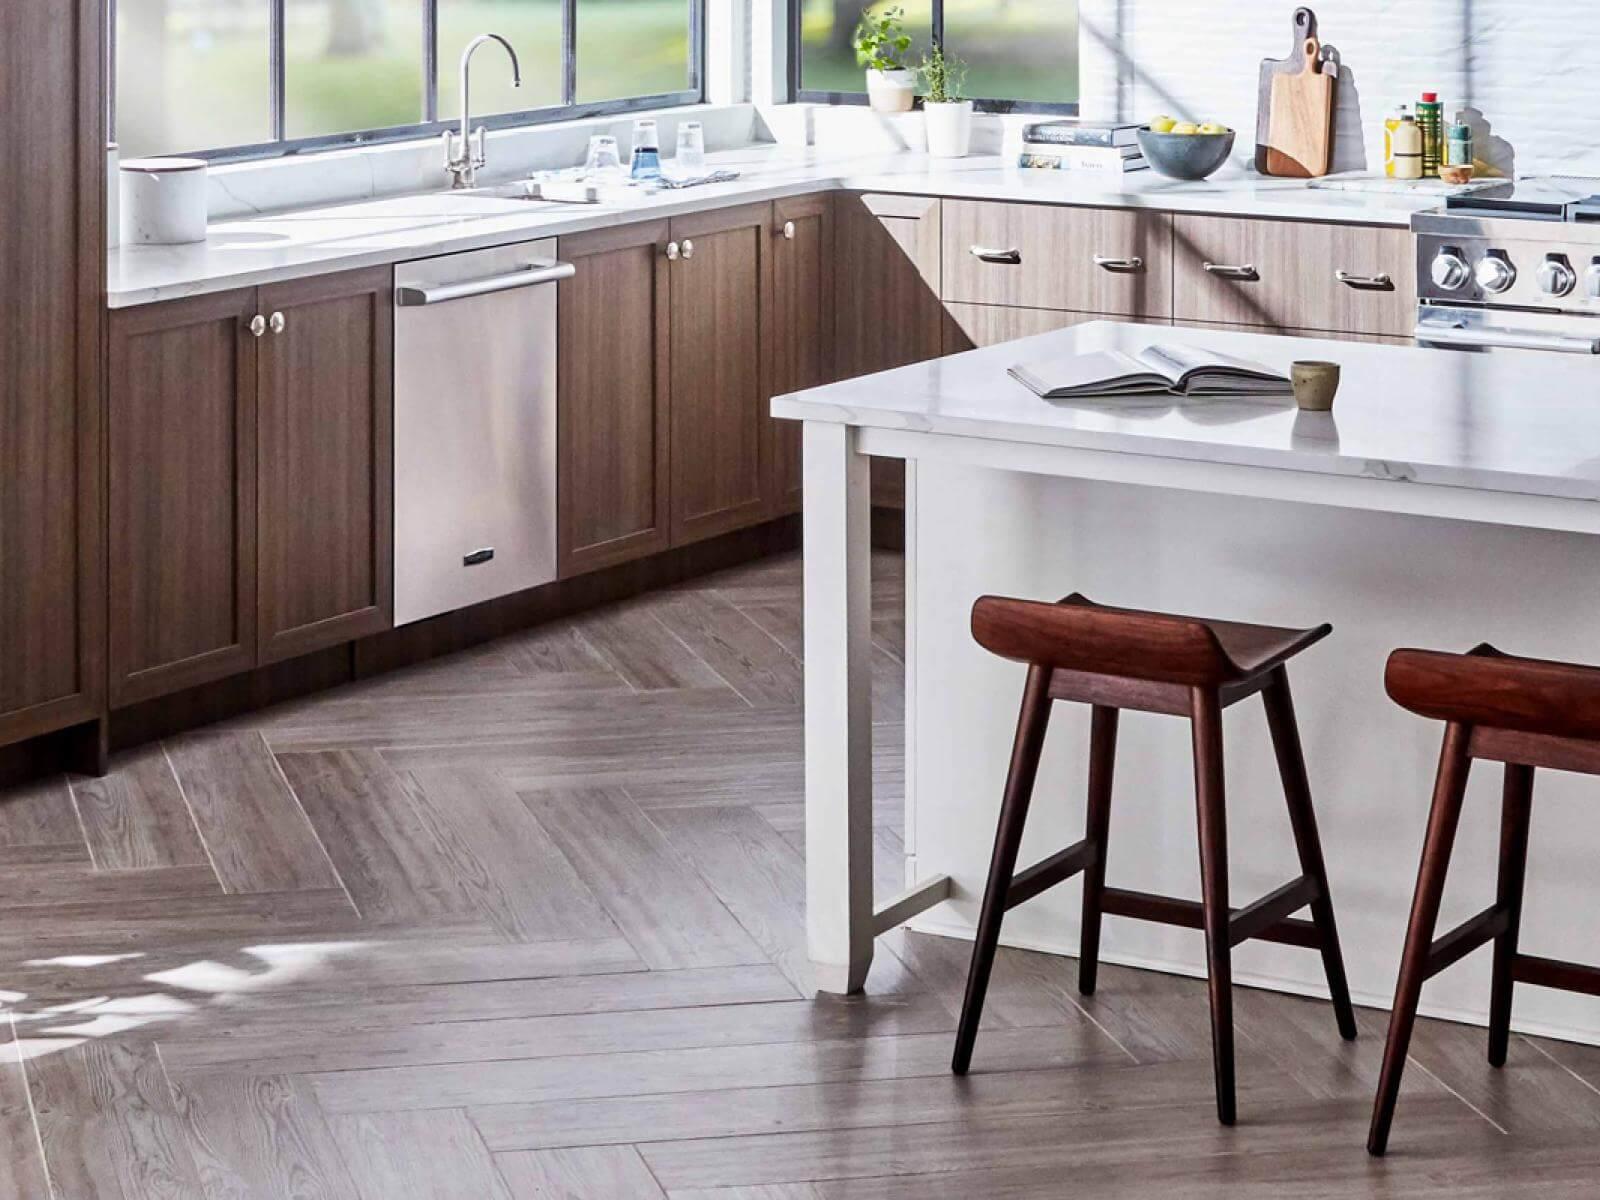 Full Suite of Kitchen Appliances by Signature Kitchen Suite